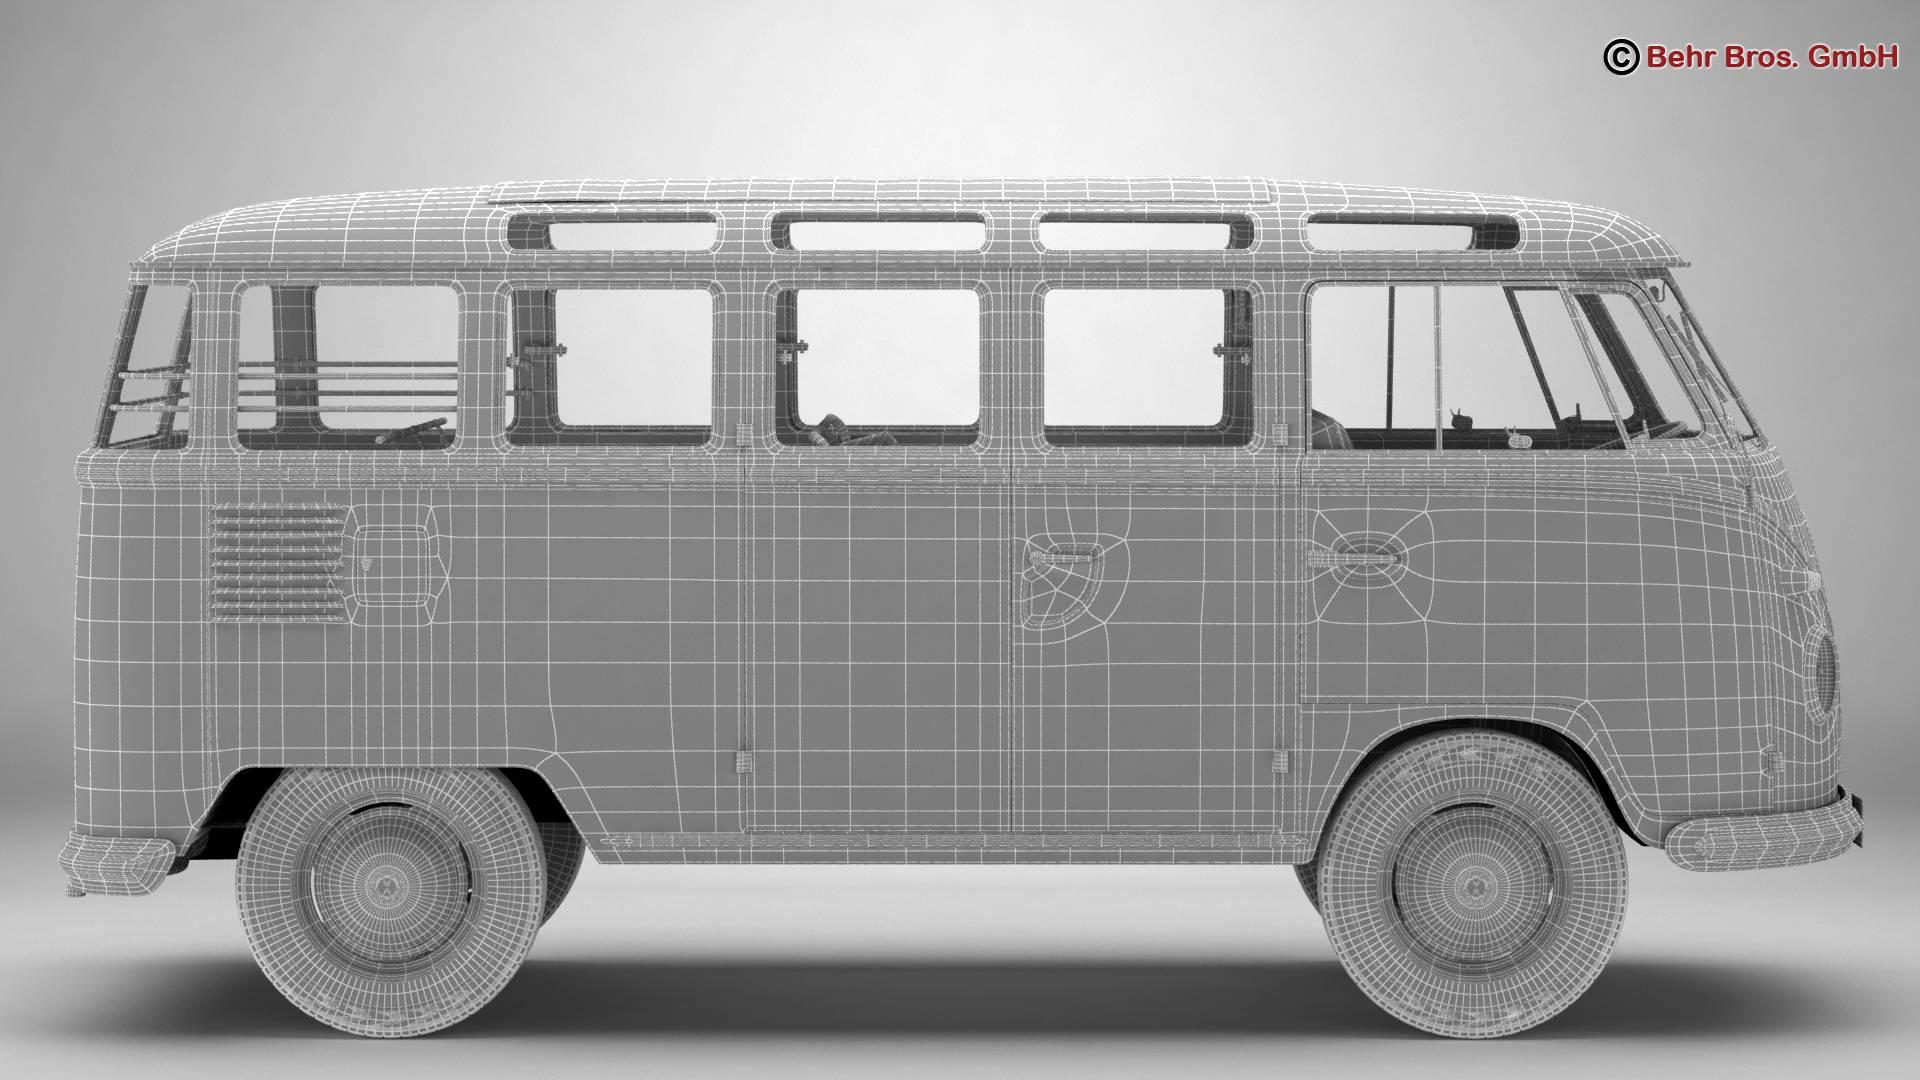 volkswagen type 2 samba 1959 3d model 3ds max fbx c4d lwo ma mb obj 217126